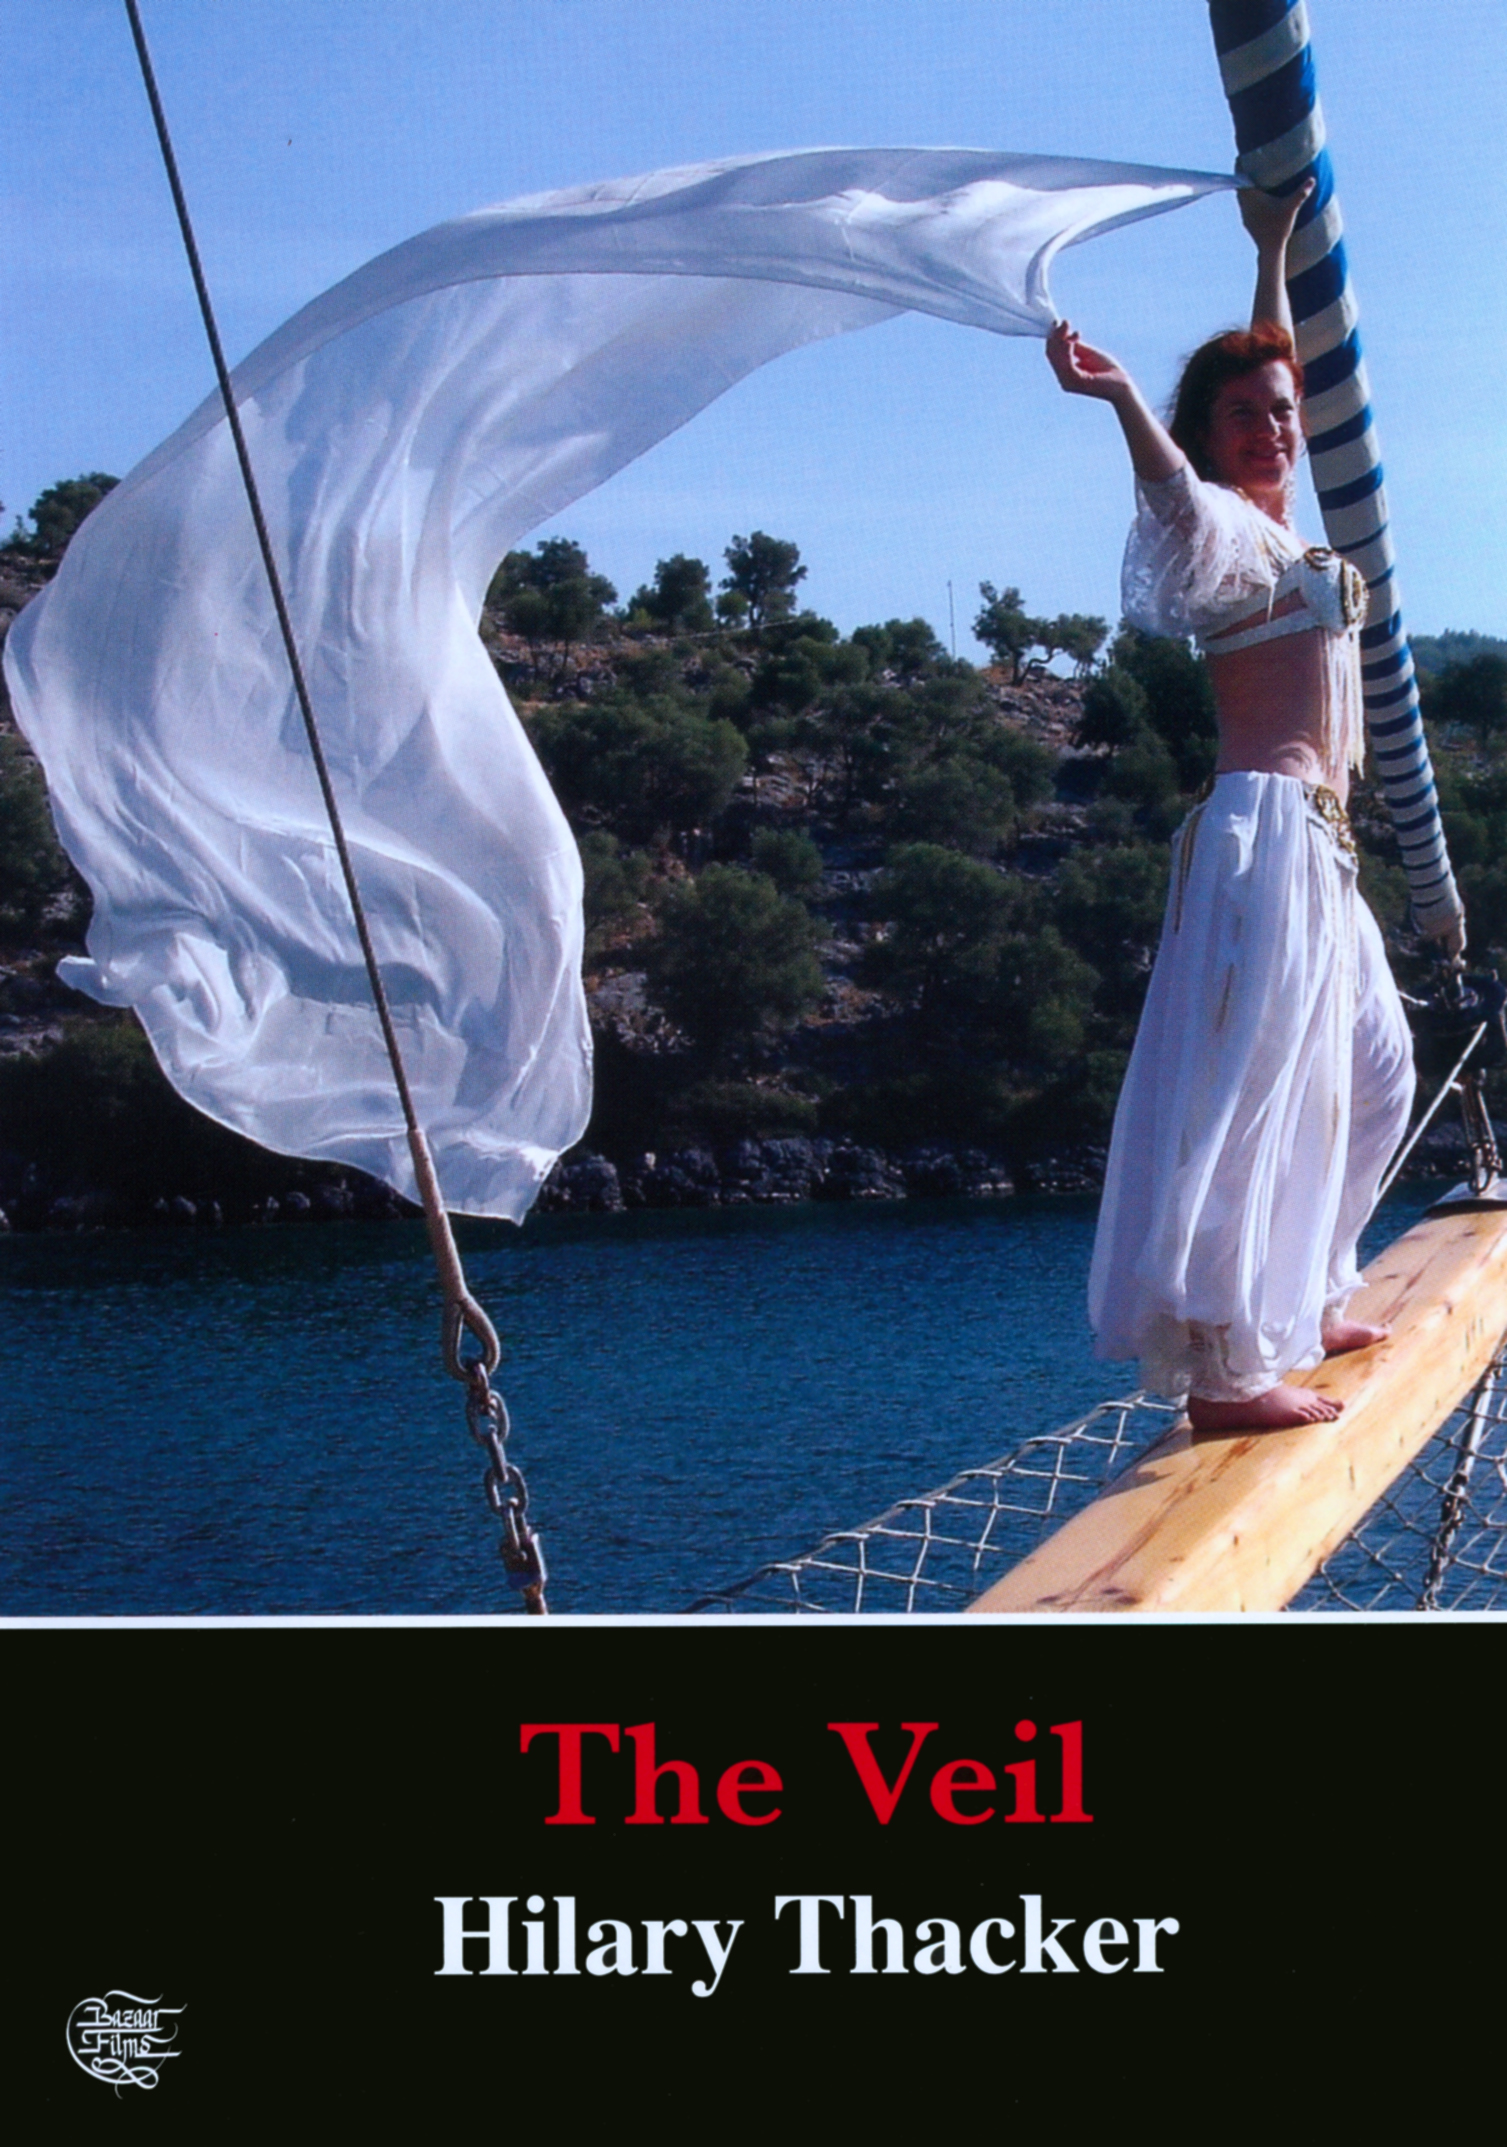 Hilary Thacker: The Veil